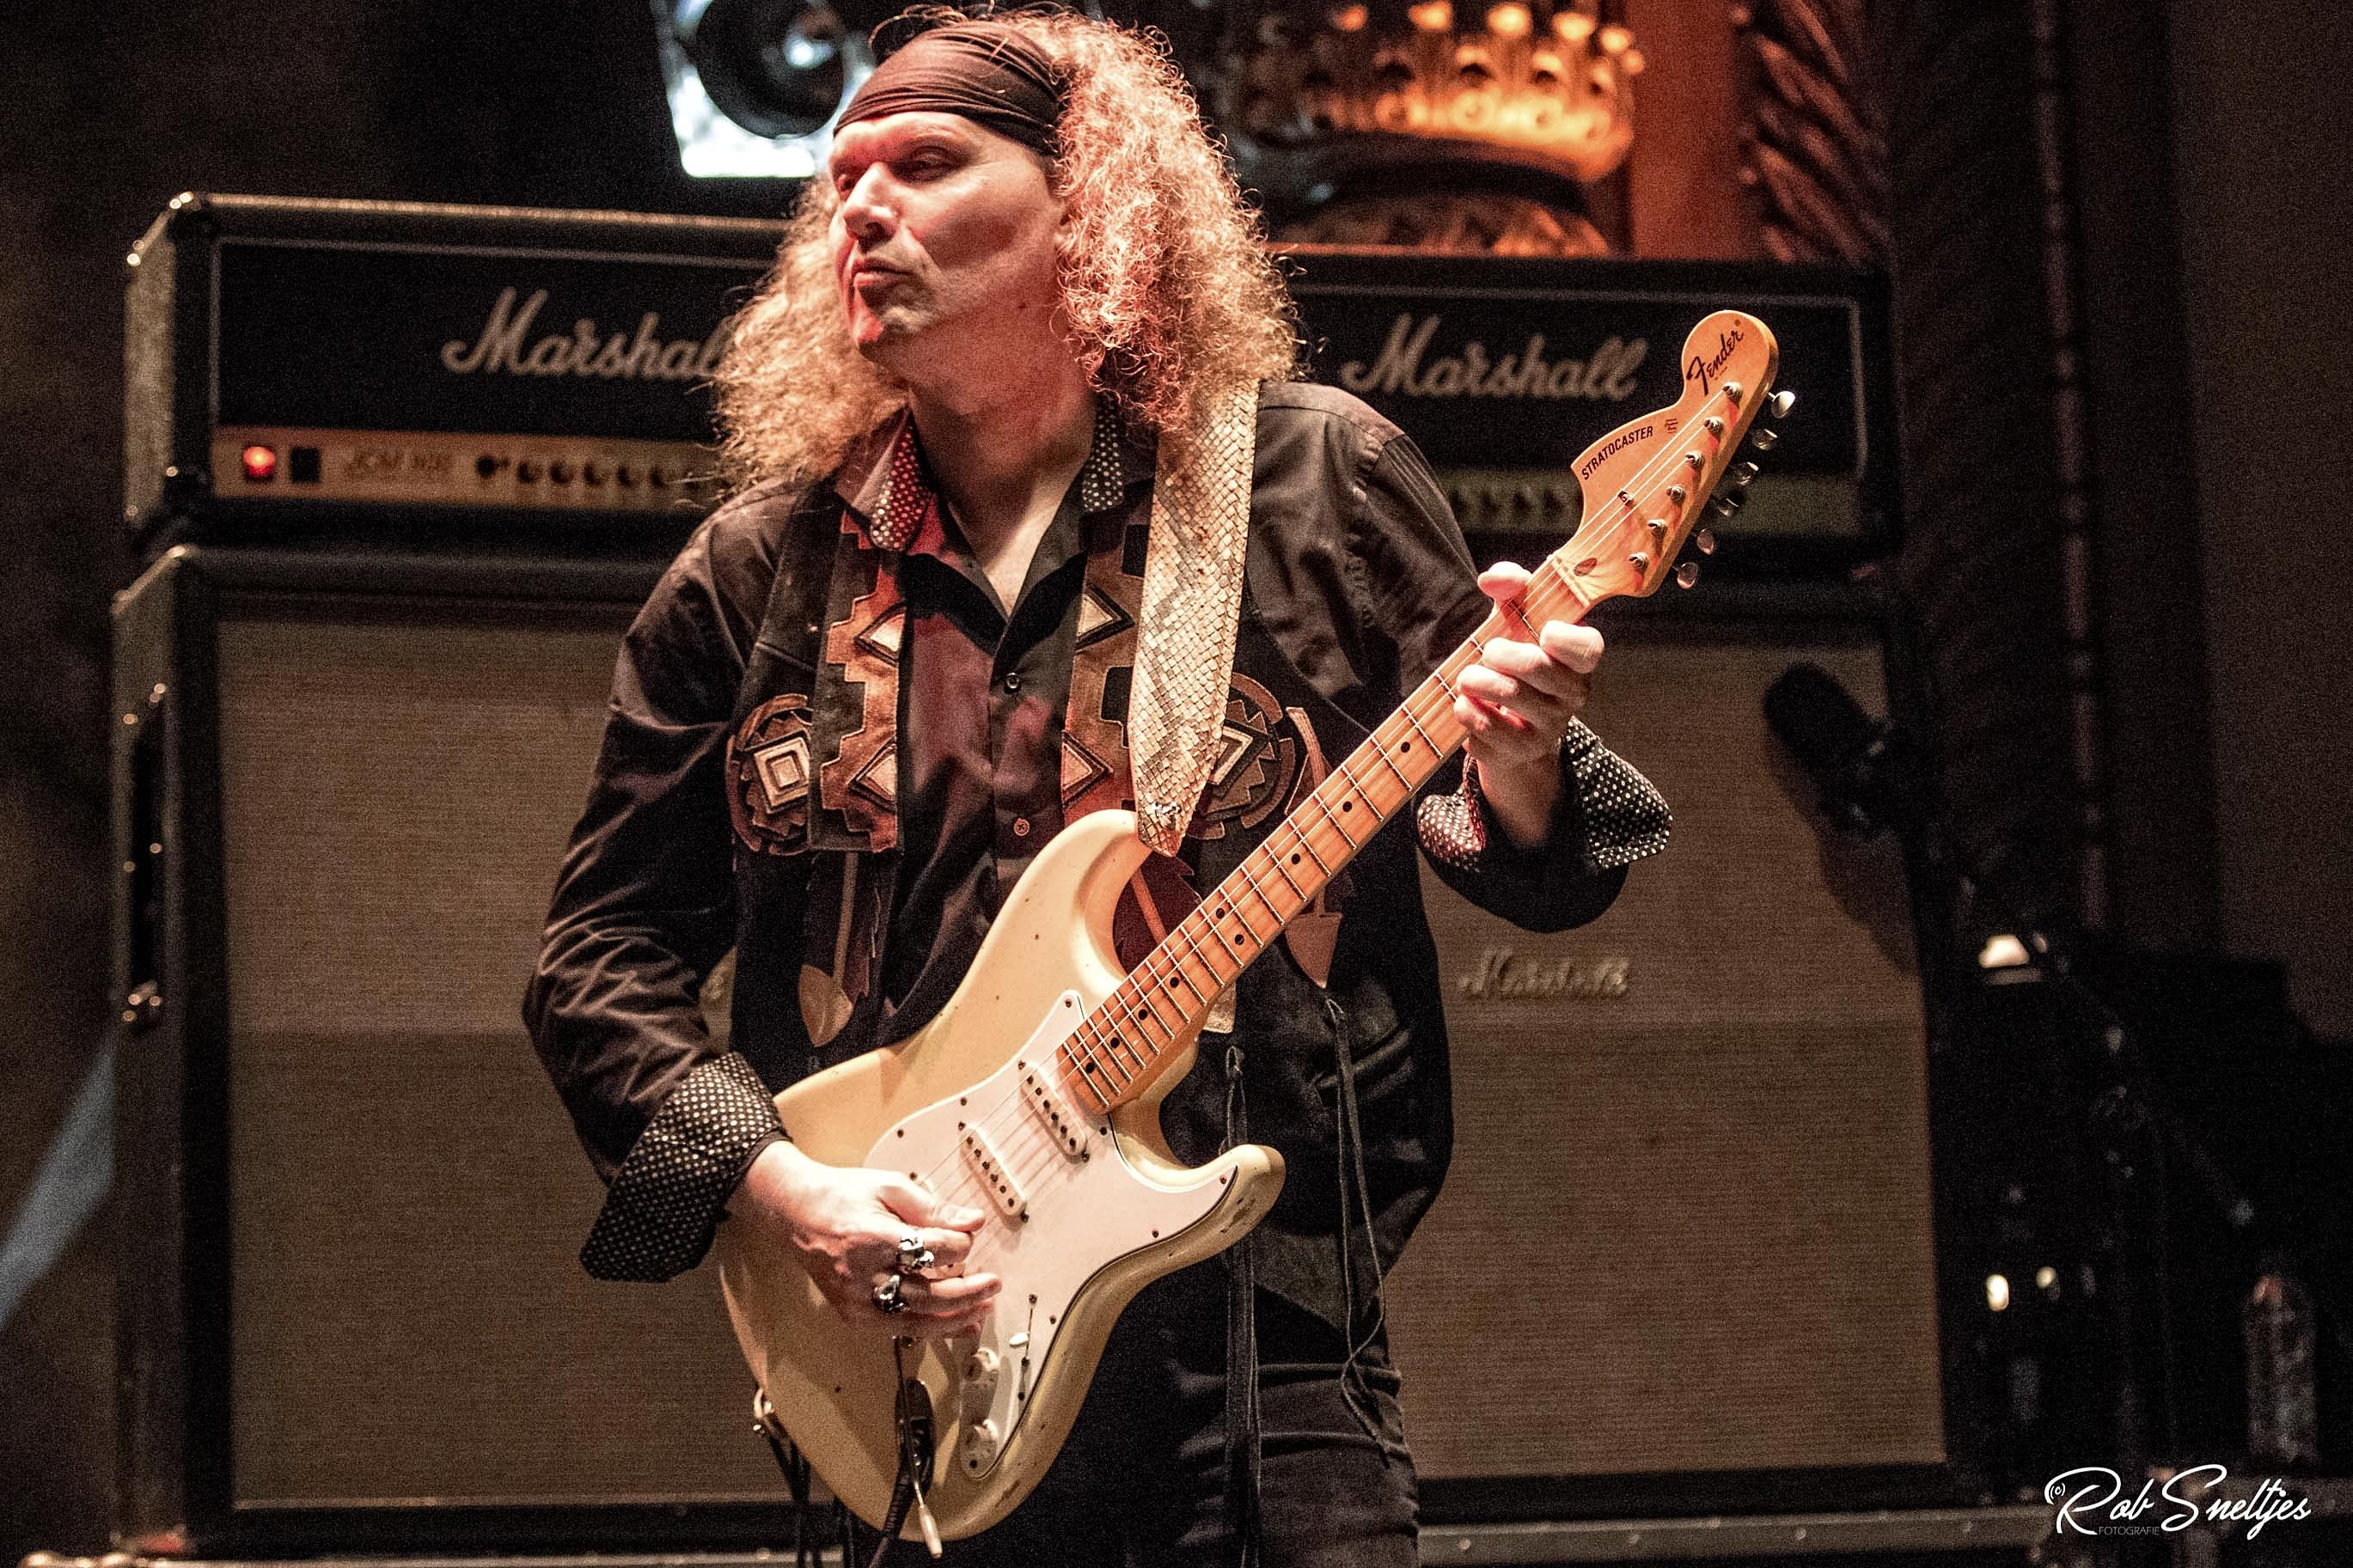 Julian-Sas-Band-Luxor-Live-Arnhem-2018-©RobSneltjes6K4A5273-copy-55